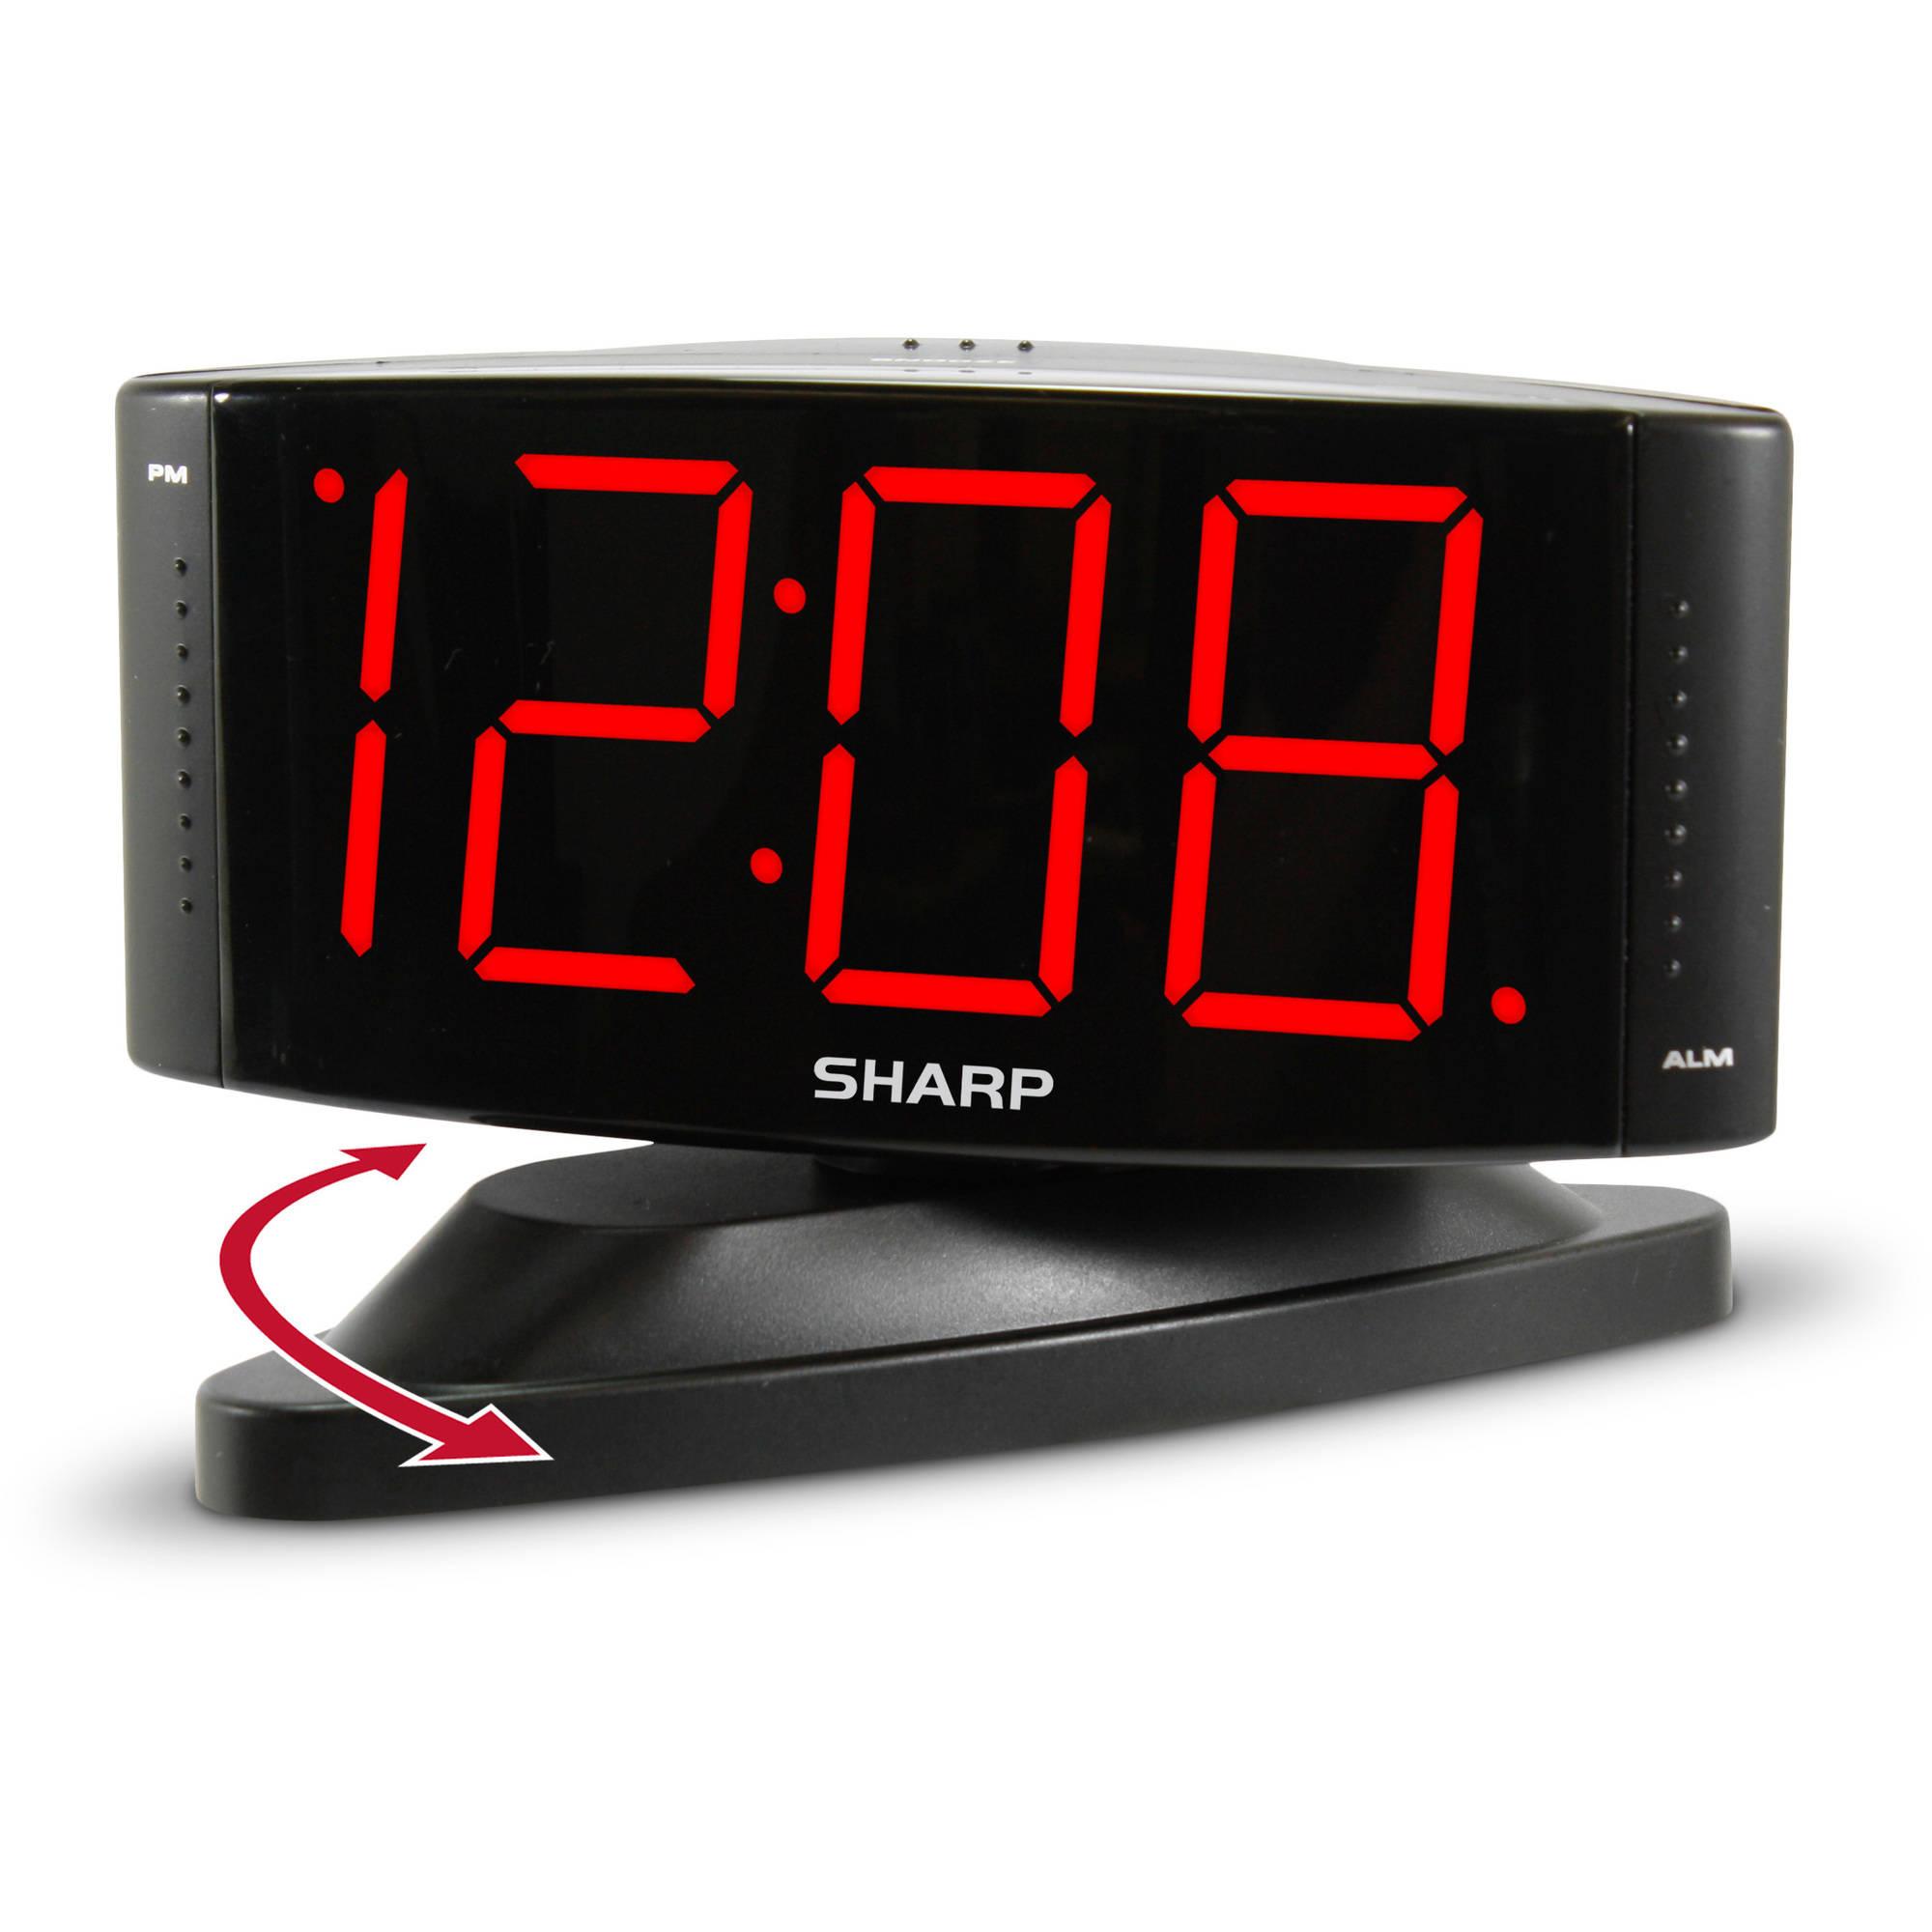 Iphone 6 Alarm Clock Docking Stations